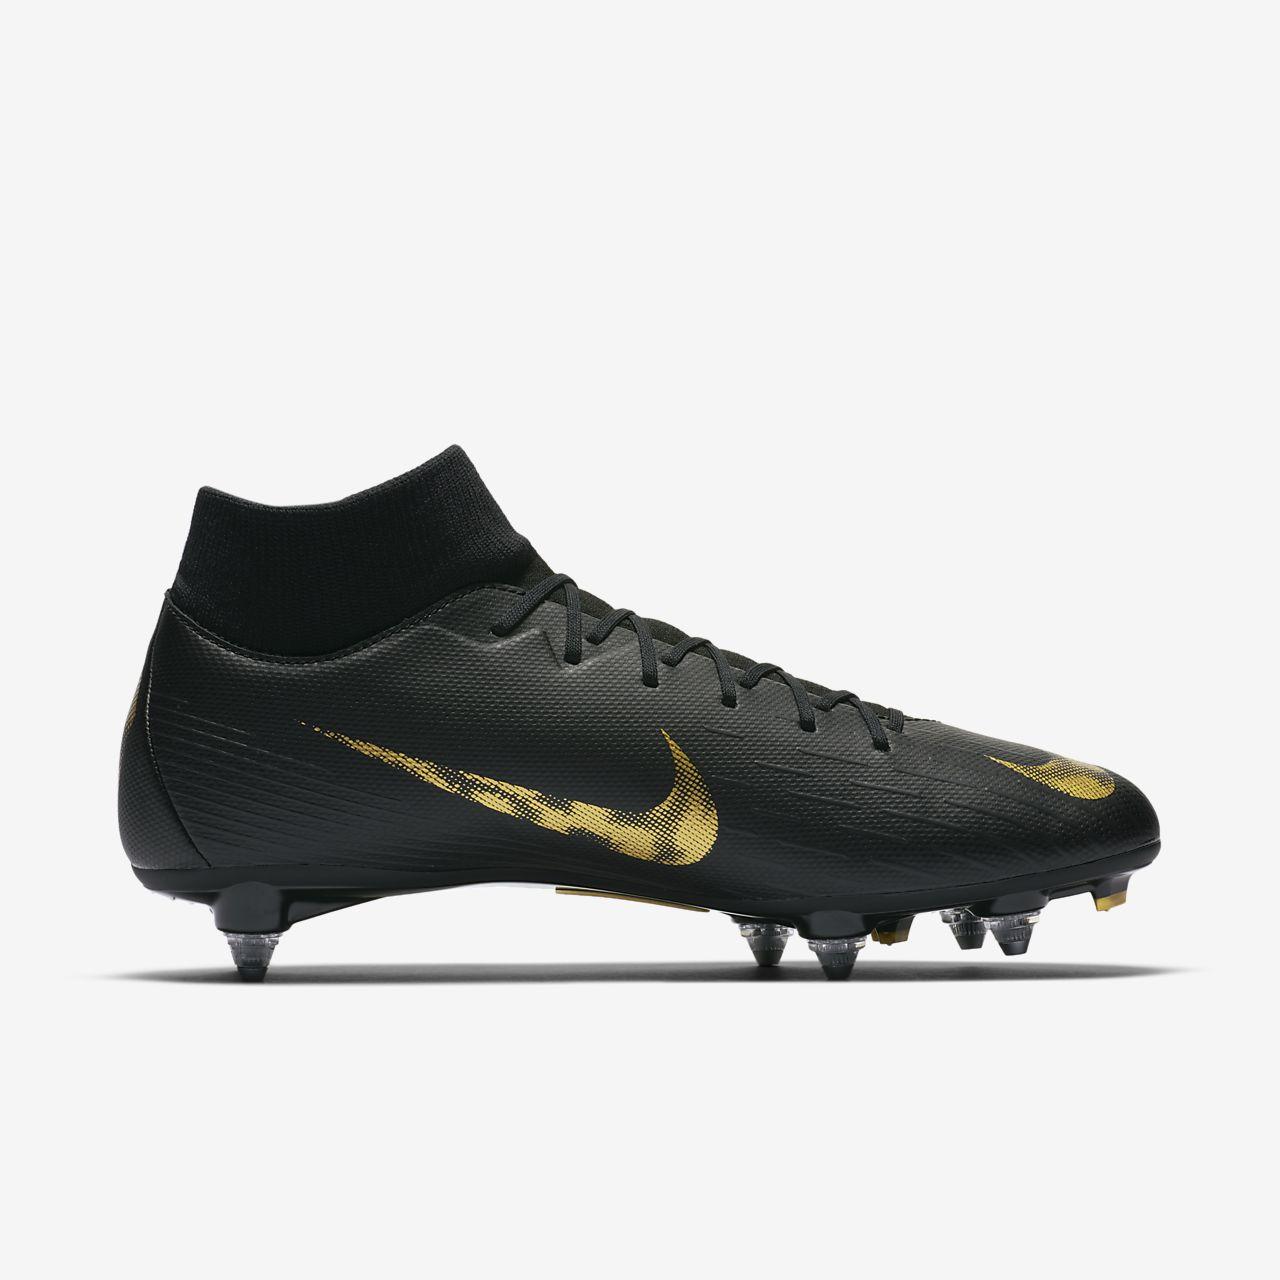 d692cfae ... Футбольные бутсы для игры на мягком грунте Nike Mercurial Superfly VI  Academy SG-PRO